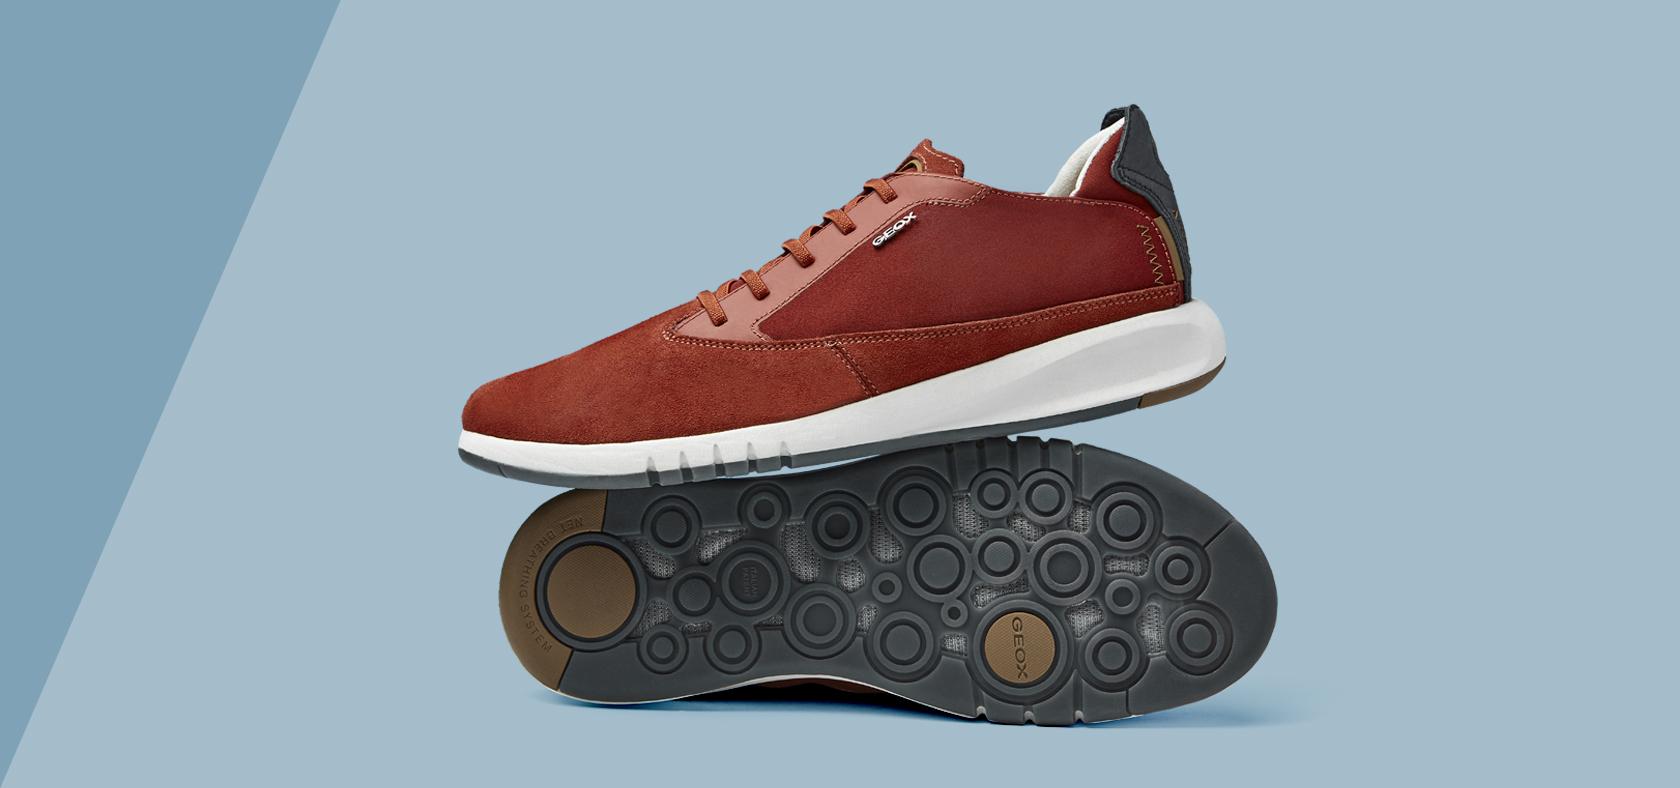 sehen am modischsten am besten billig Aerantis Shoes with an Innovative Technology System | Geox